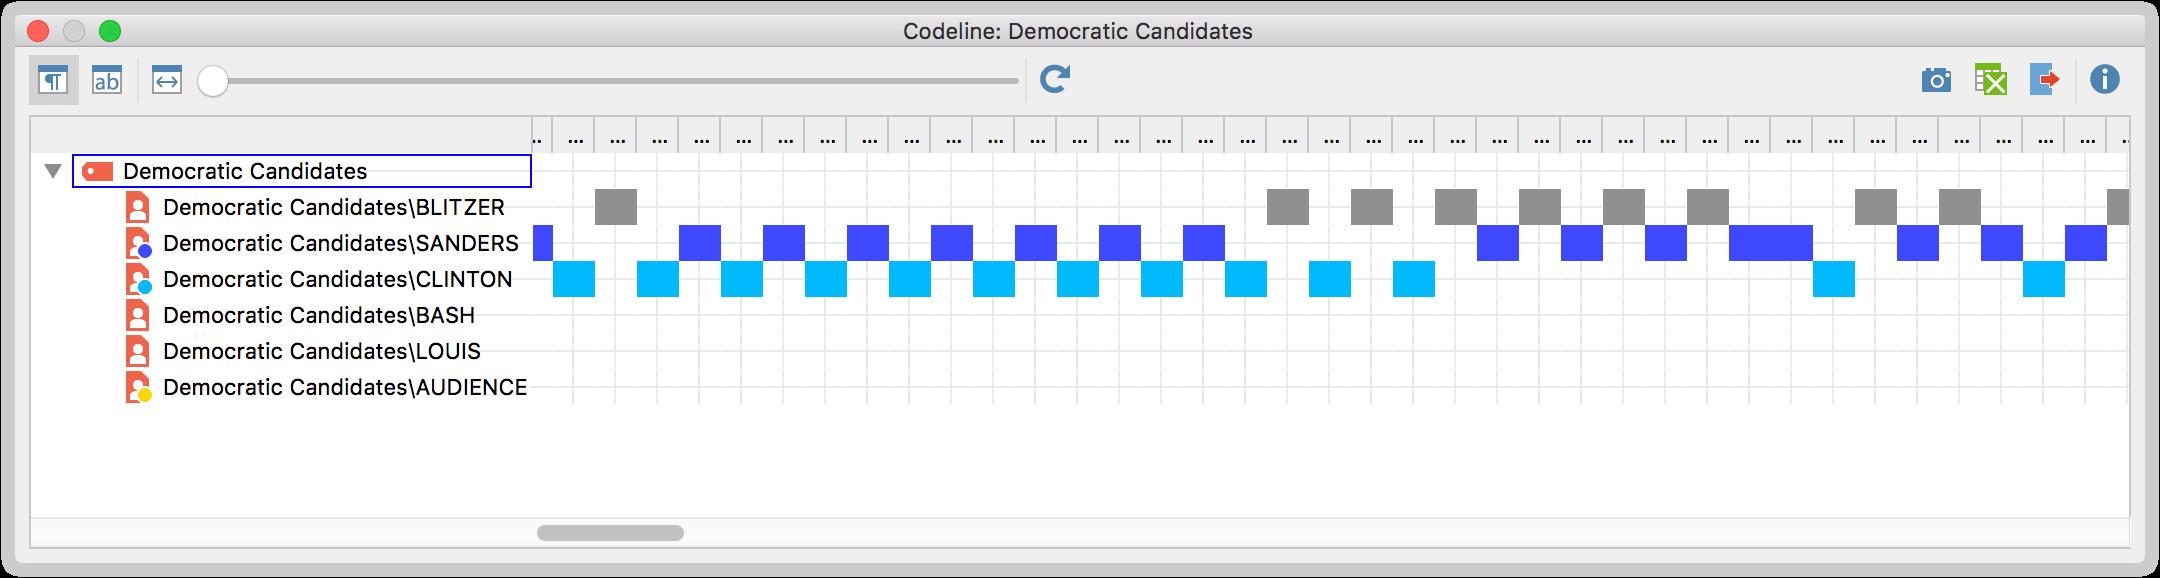 codeline_democrats